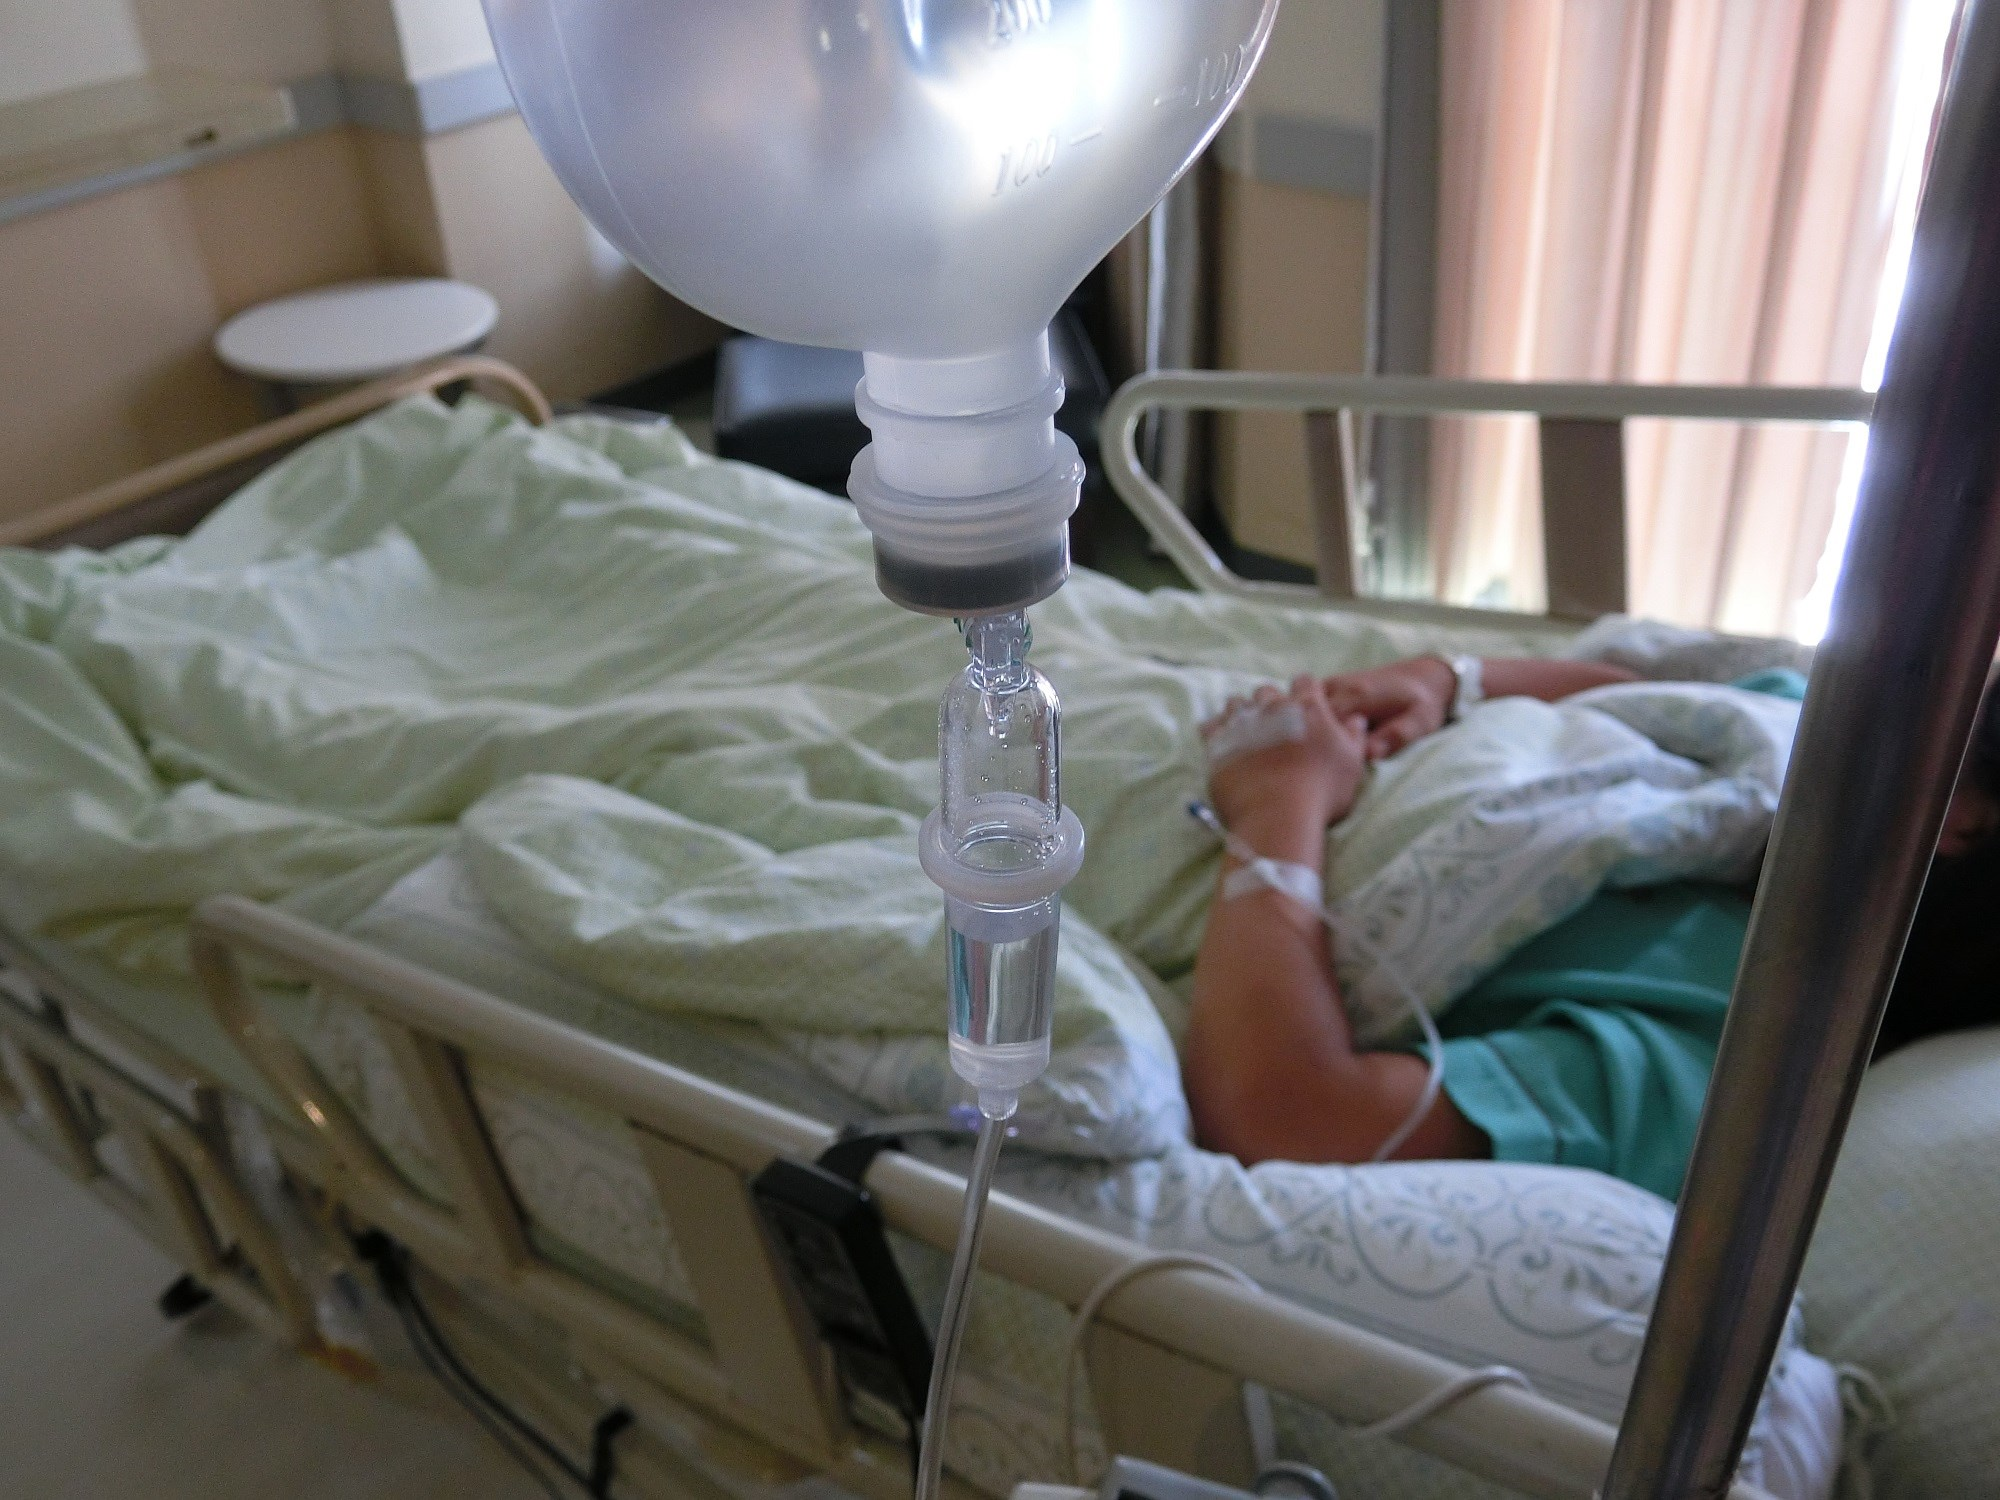 Sodium Chloride Fluid Infusion Rates Do Not Affect Pediatric Diabetic Ketoacidosis